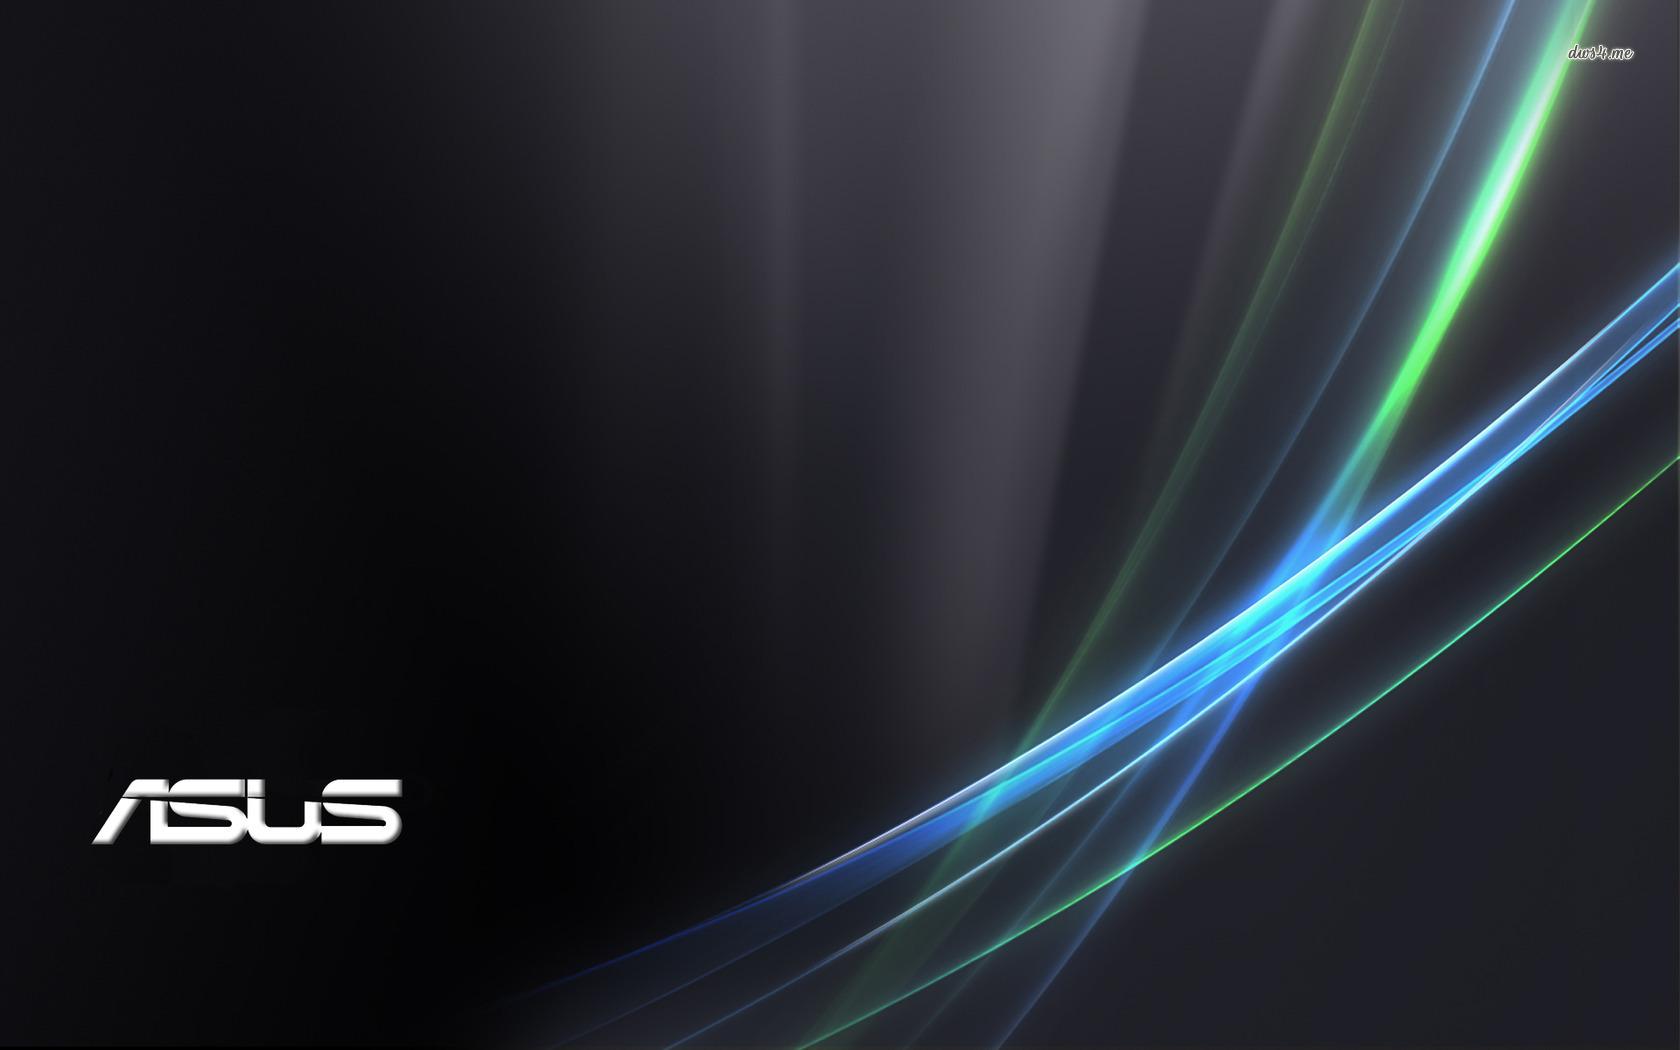 Asus Wallpapers Widescreen: ASUS Wallpapers For Desktop